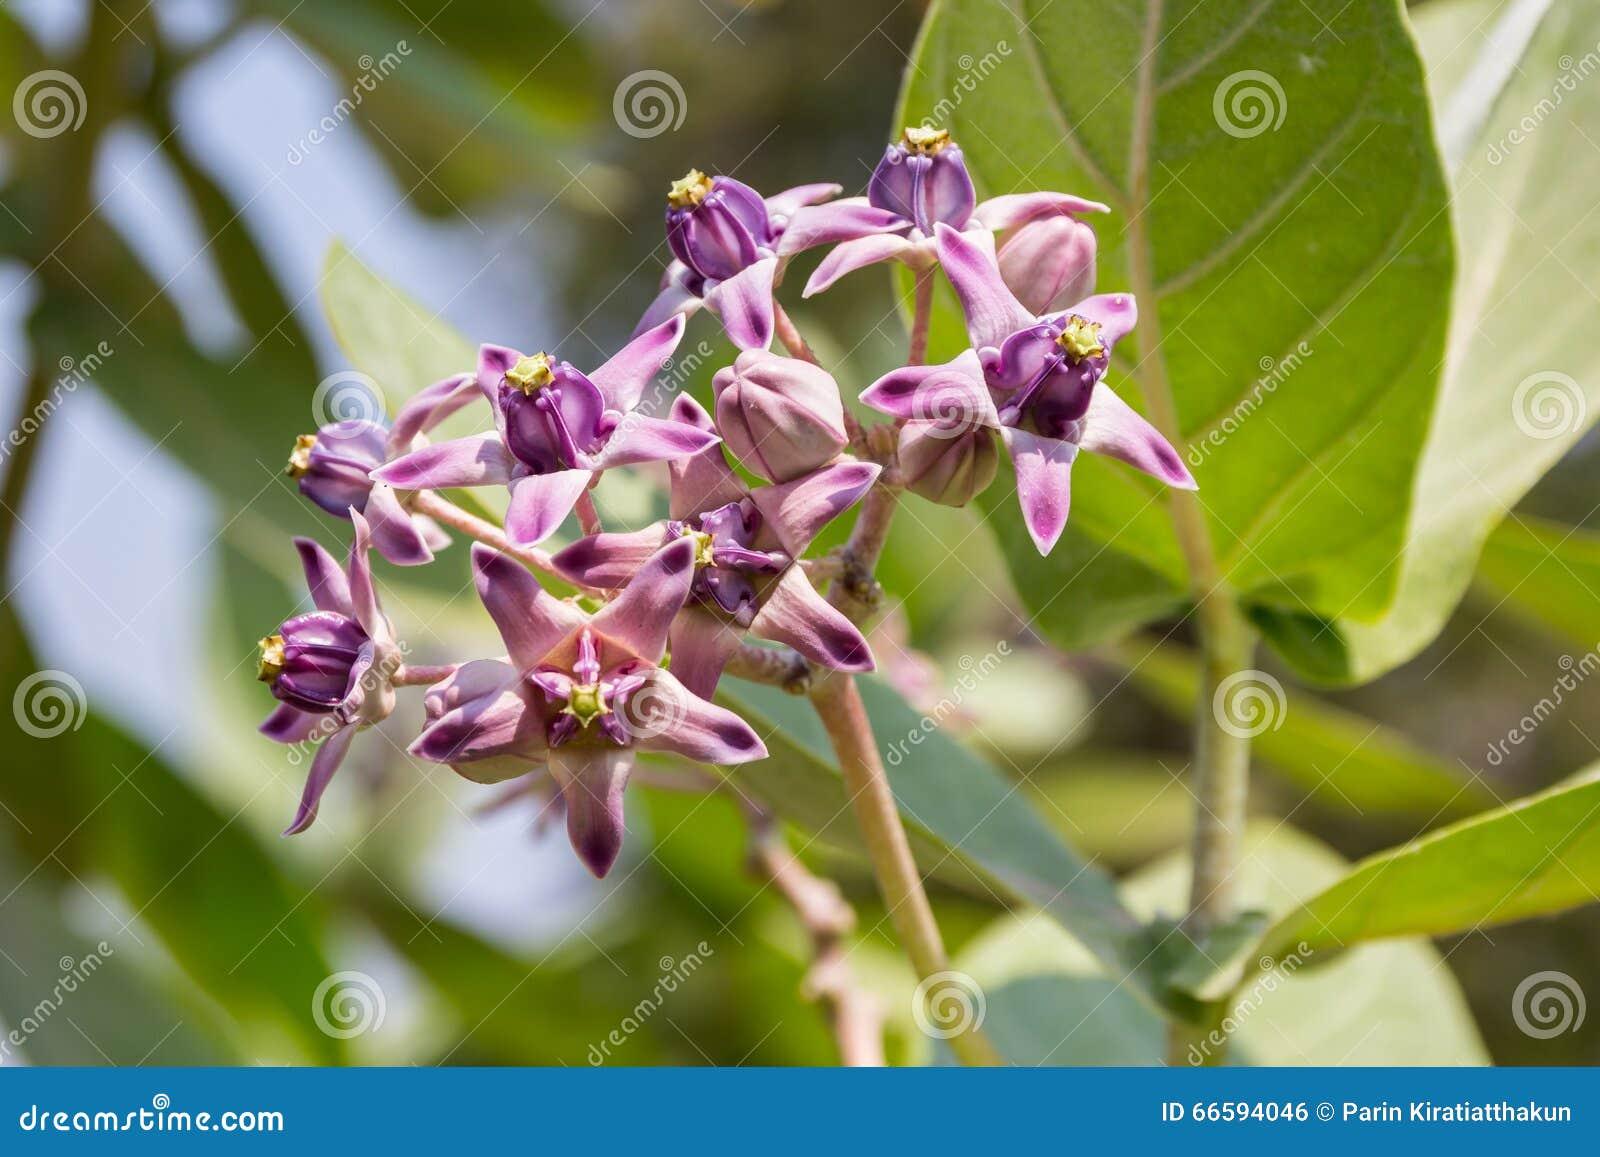 Crown Flower Tree Stock Photo Image Of Grove Crown 66594046